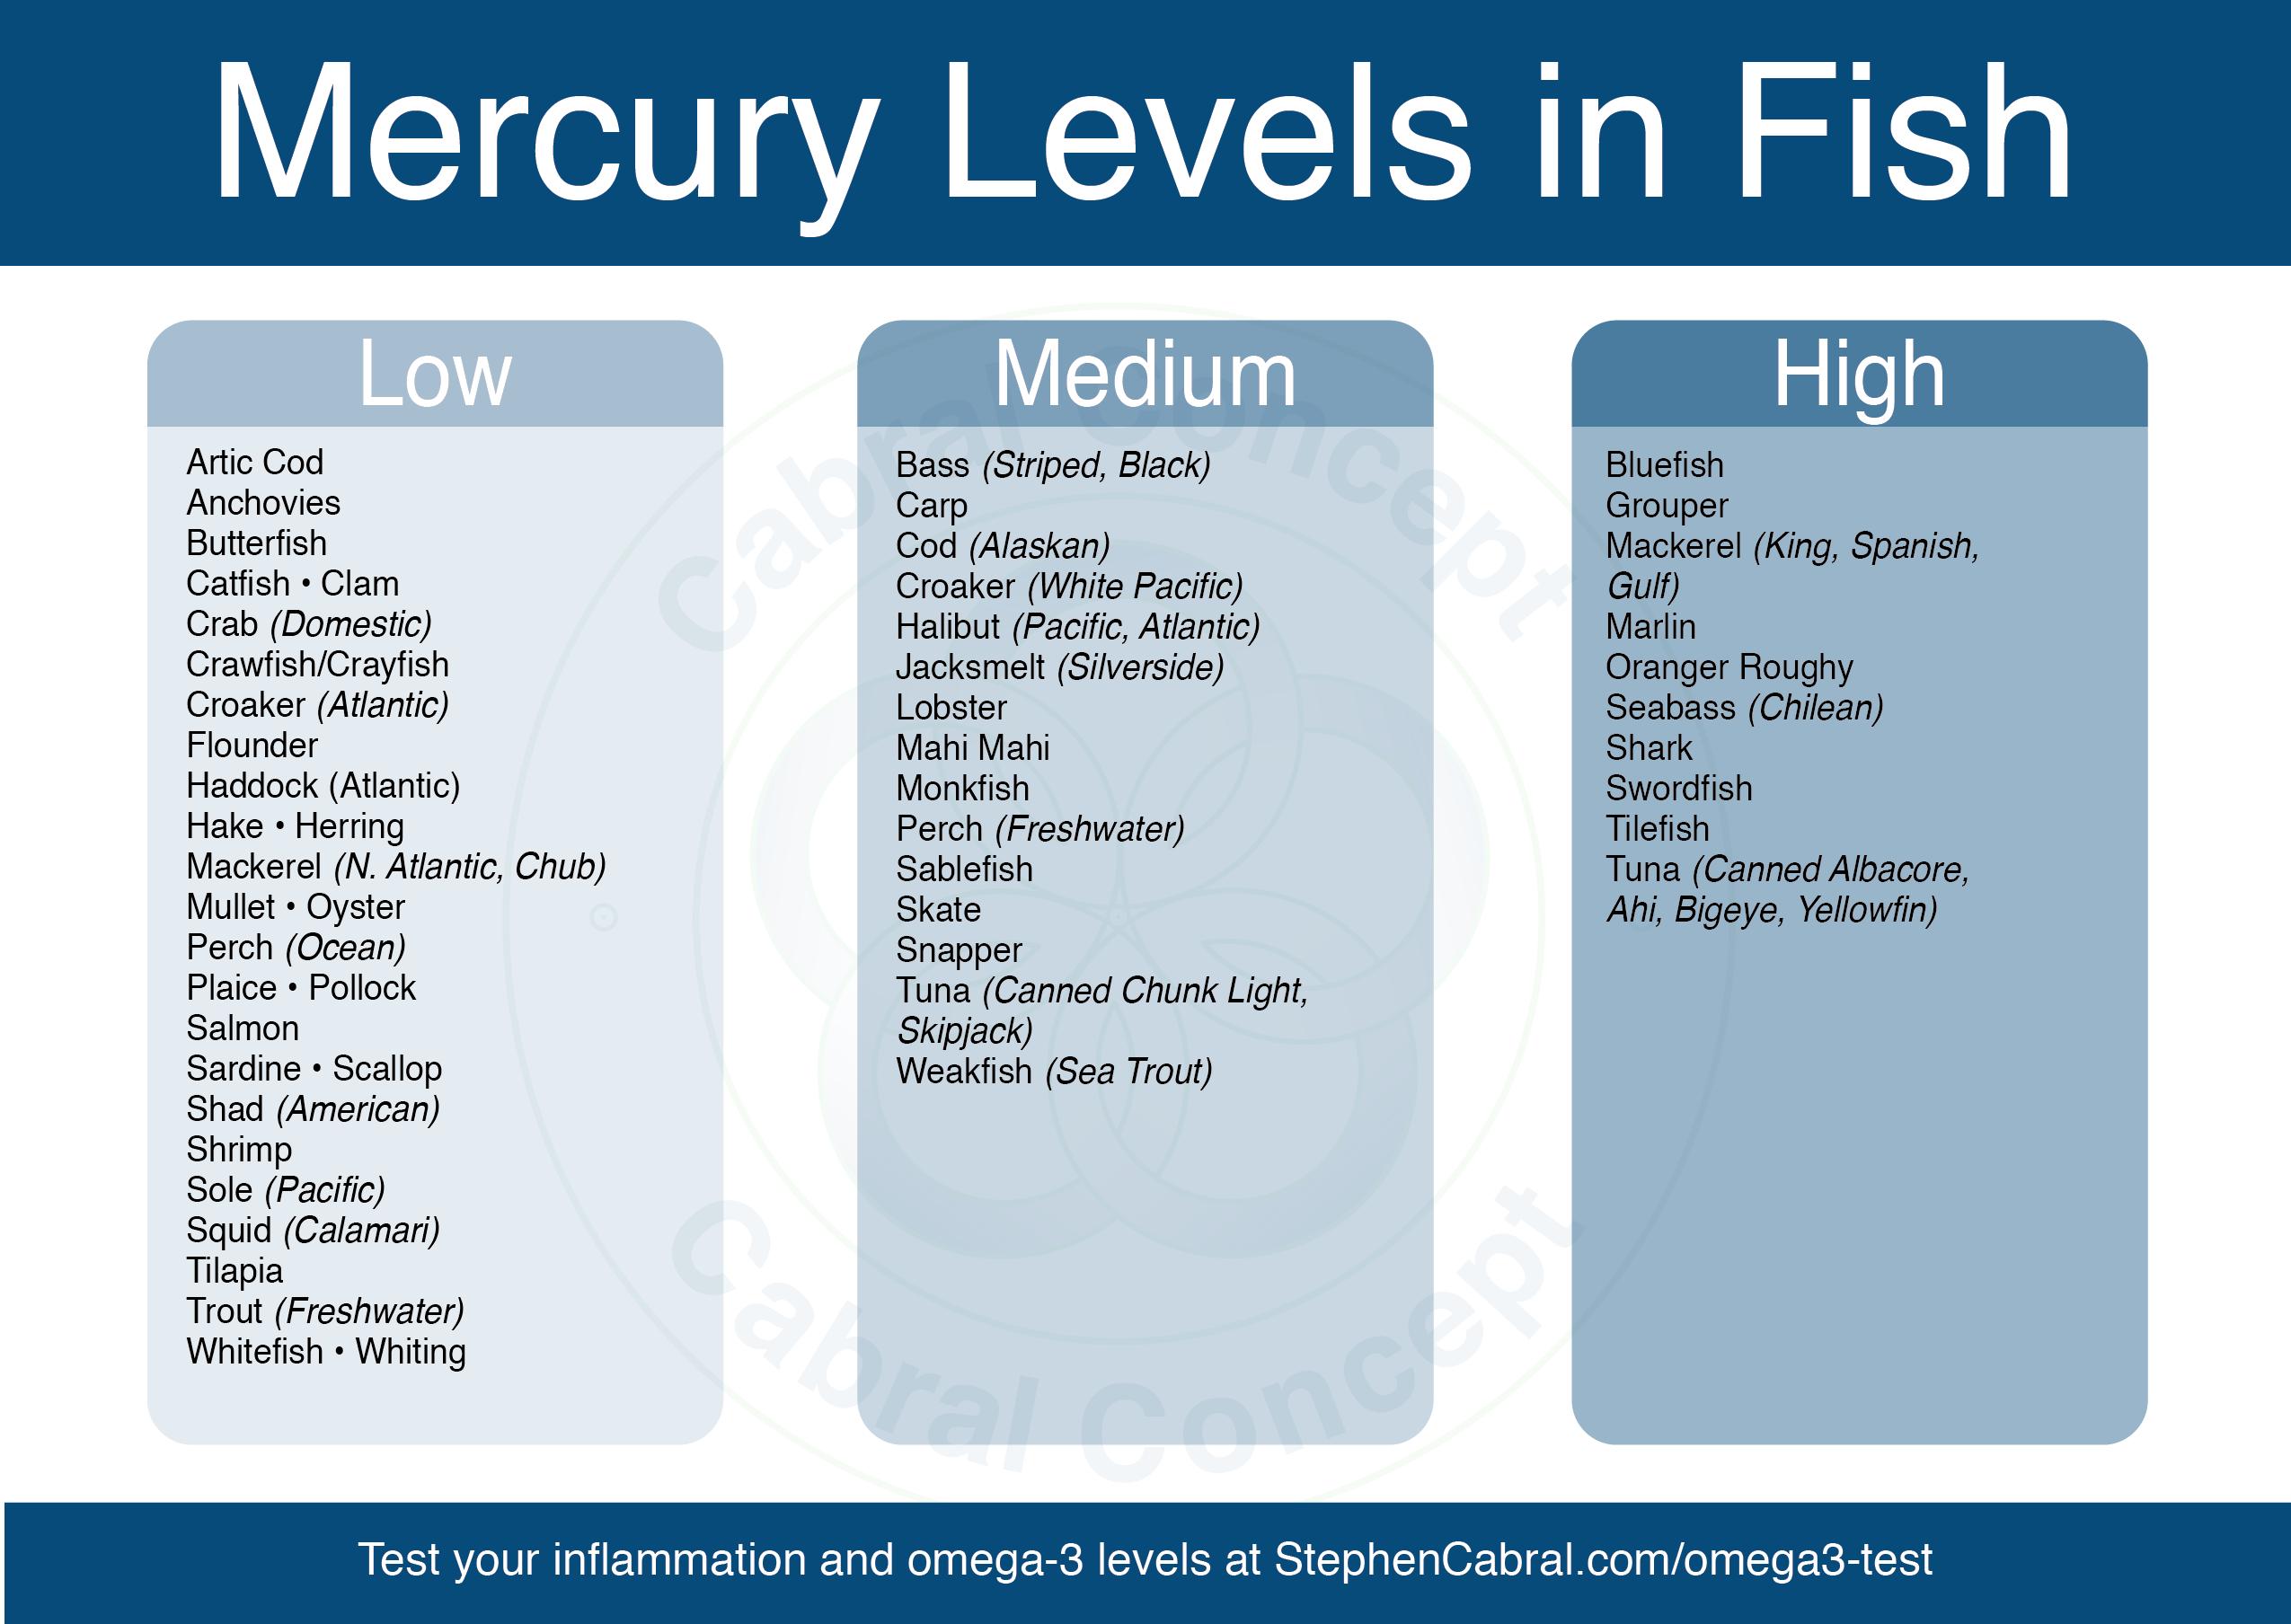 MercuryLevelsInFish-01